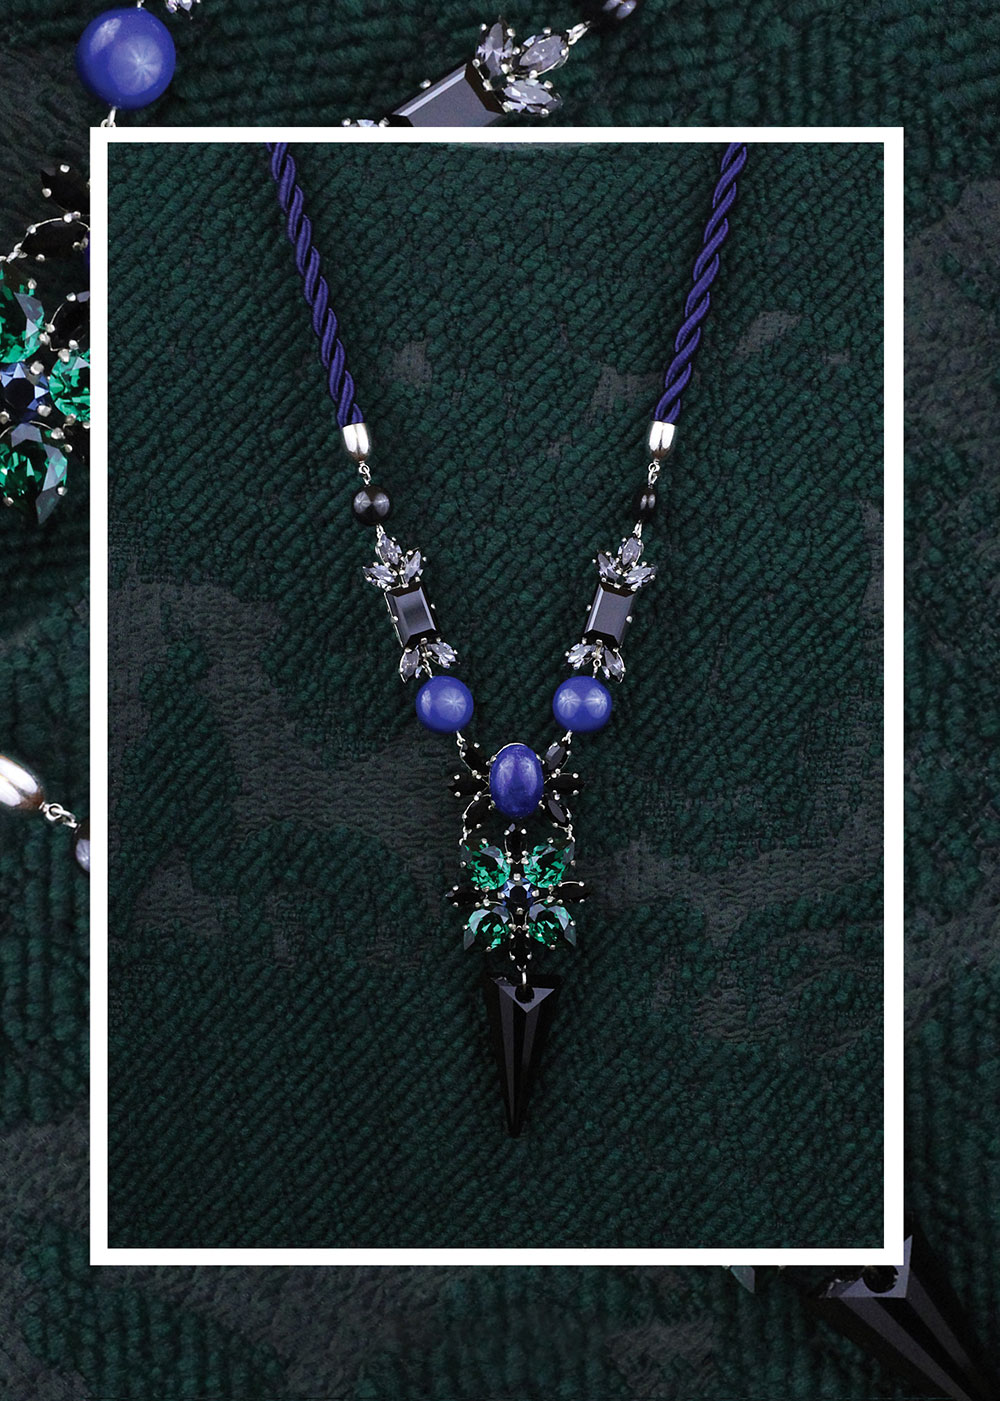 02_colier_josephine_-cristale-_swarovski_negre_verde_smarald_gri_pietre_semi-pretioase_lapis_lazuli